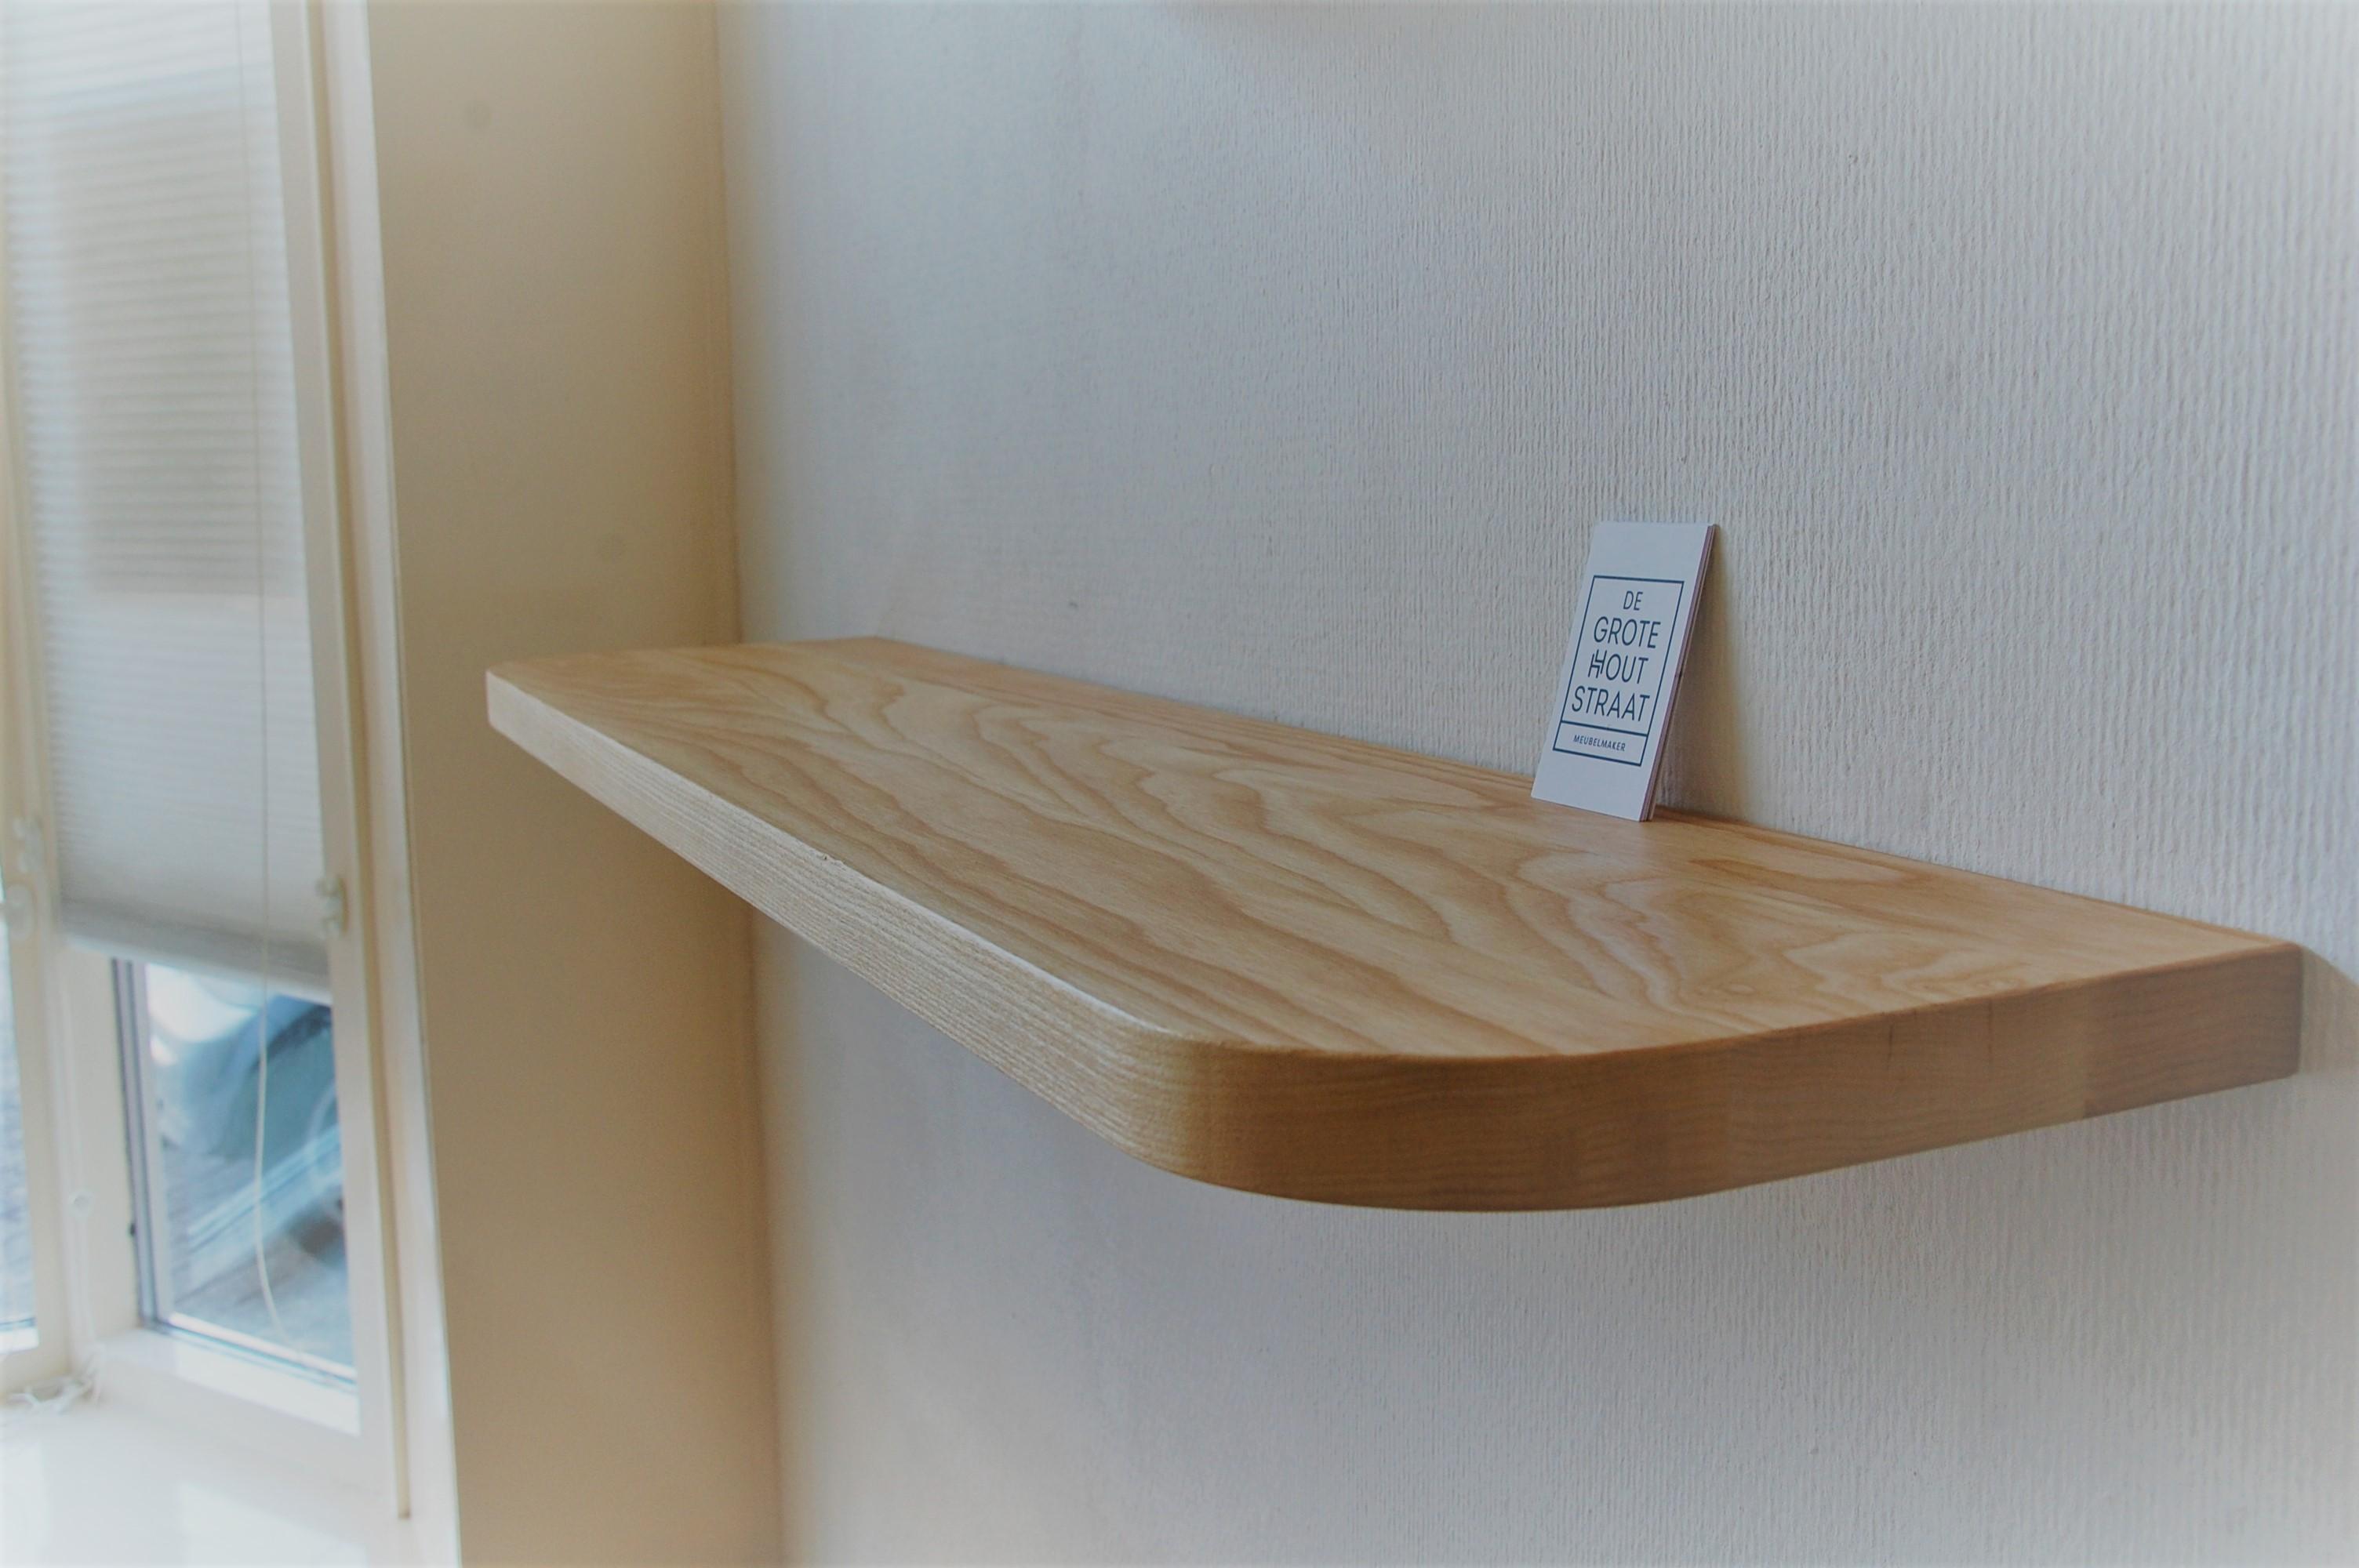 zwevende plank